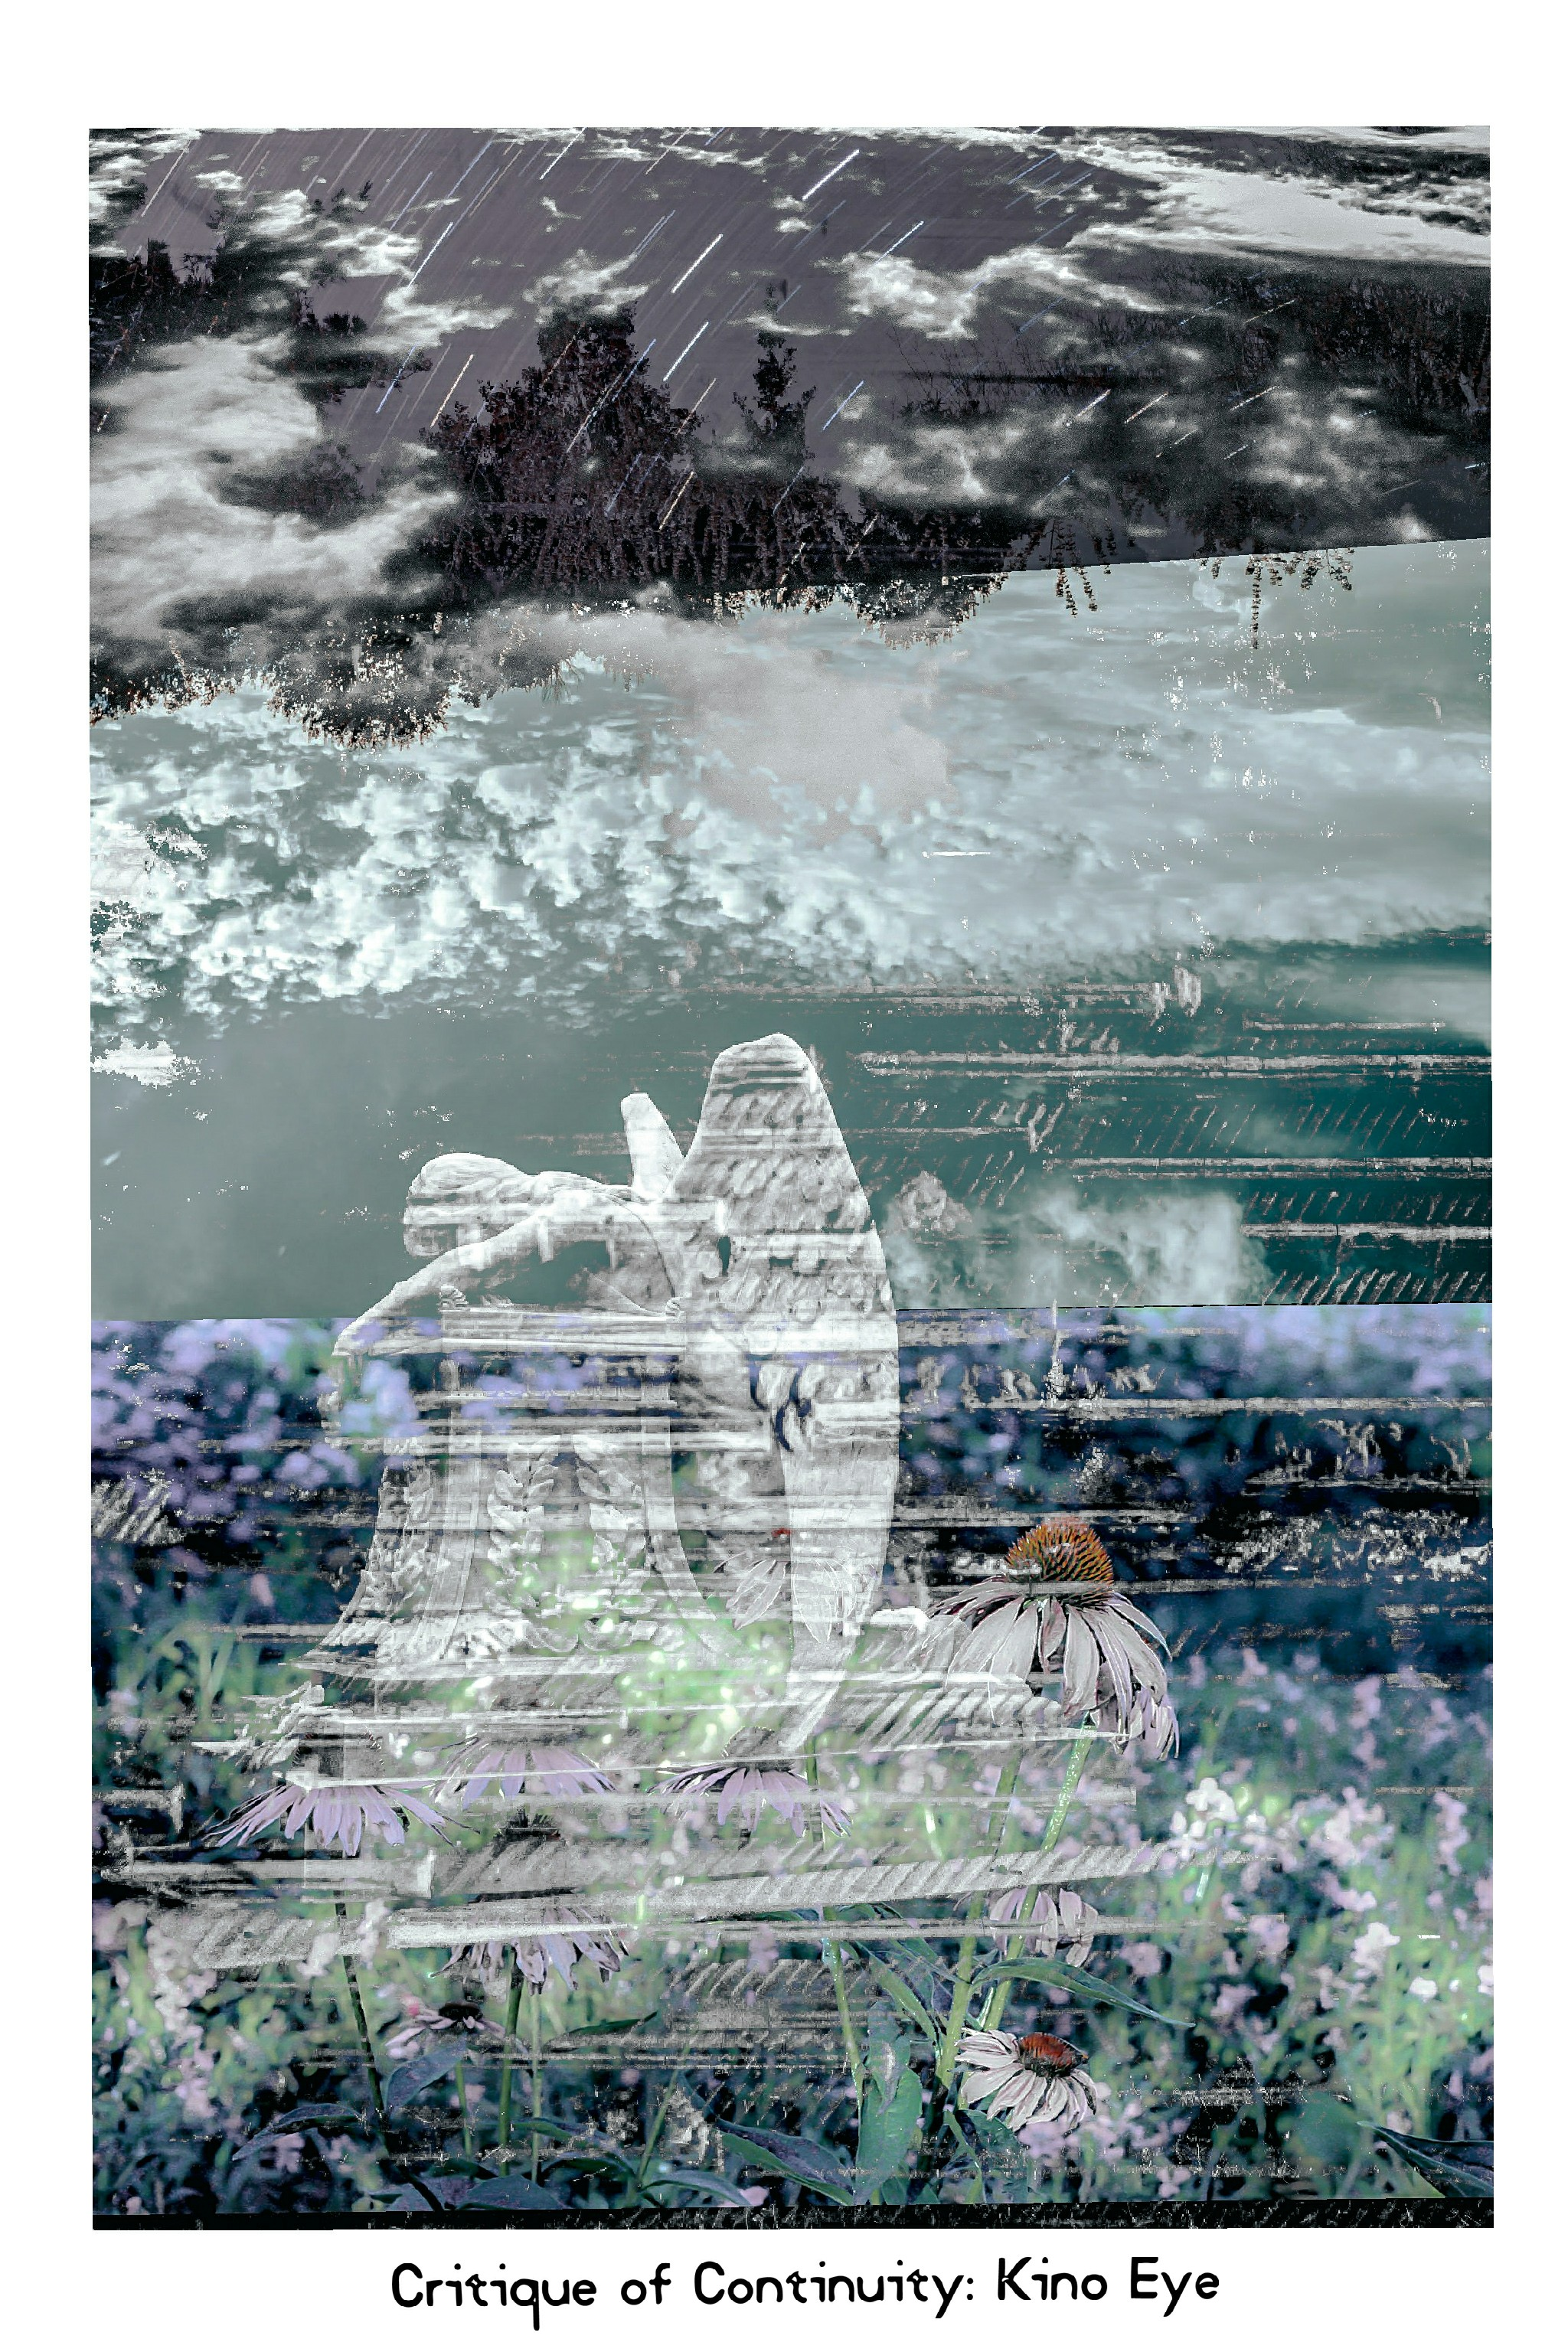 (Digital Photographs & Film in the Post Conventional Expressionist style,  FujiFilm X-Pro2, Kodak Ektar, FujiFilm Provia .Collage inspired by DADA, Sergei Eisenstein & Dziga Vertov)